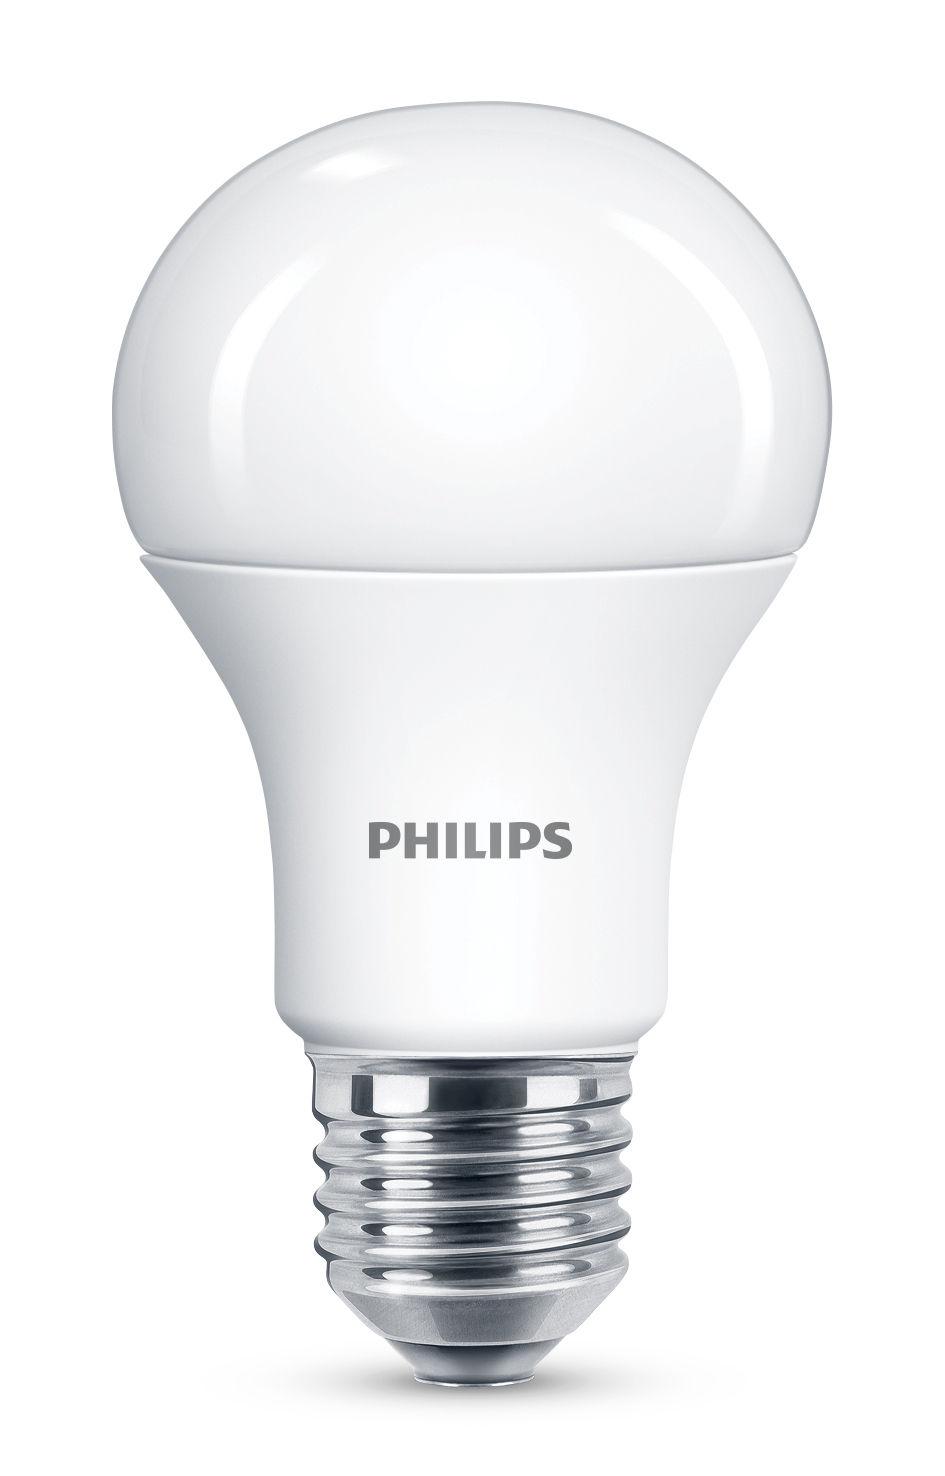 standard d polie e27 led bulb 5w 40w 470 lumen 5w 40w by philips. Black Bedroom Furniture Sets. Home Design Ideas